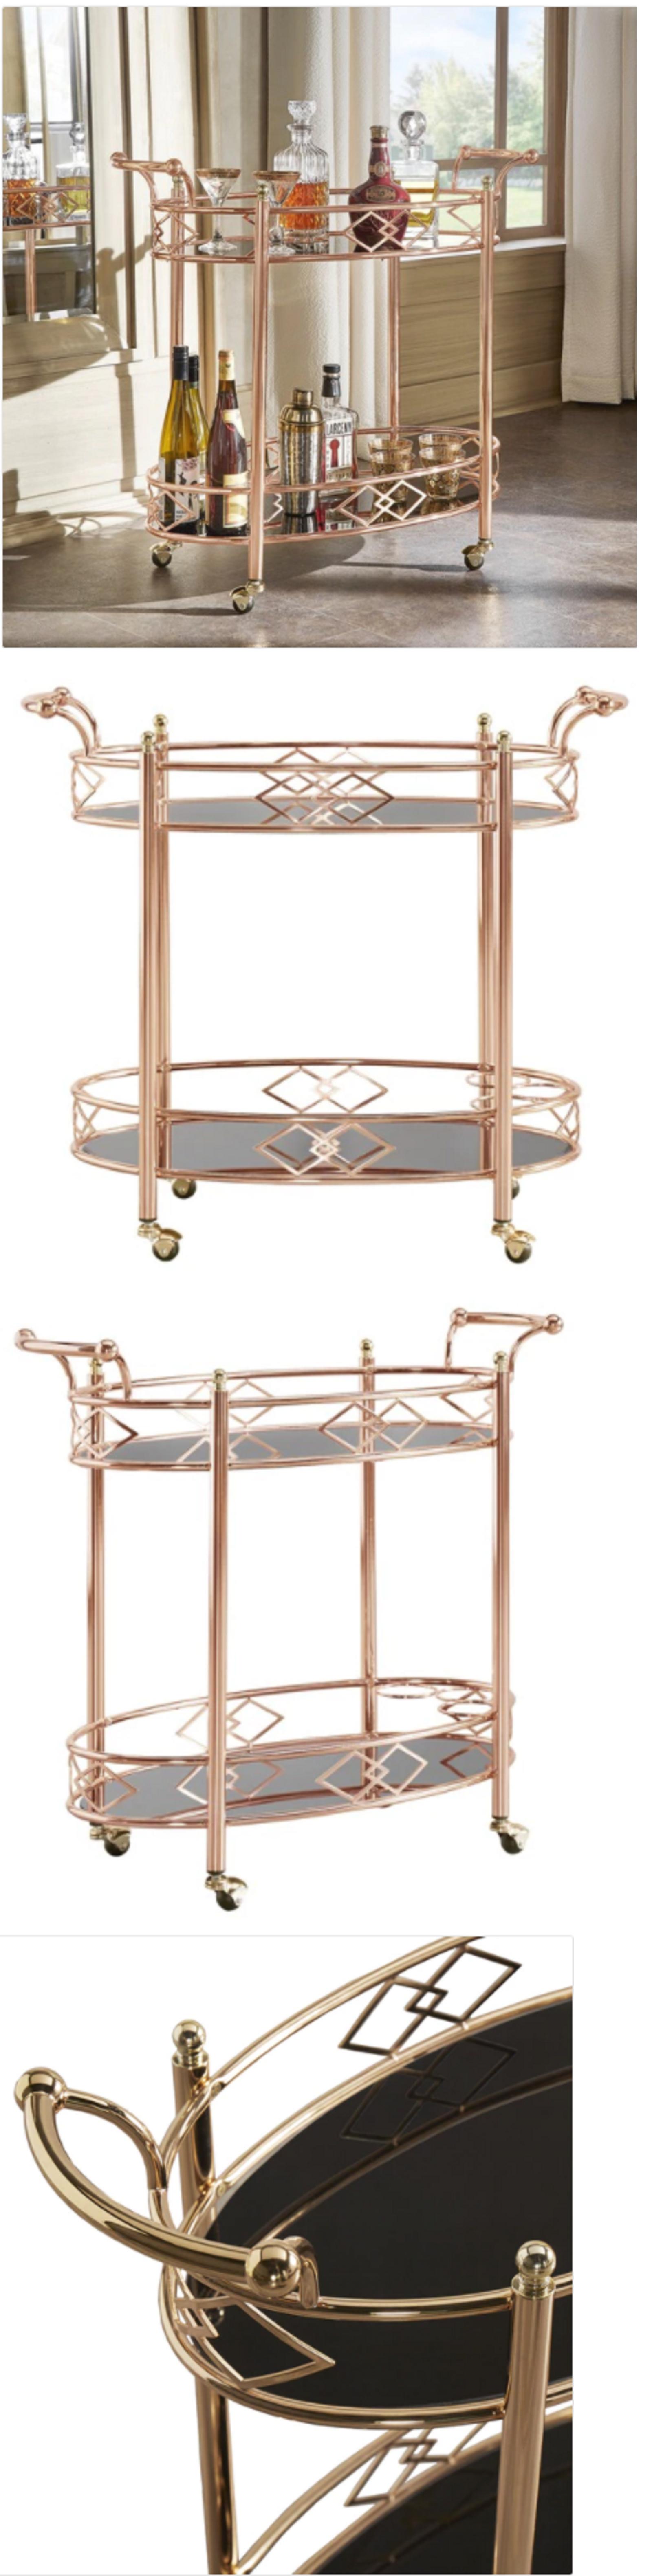 Kitchen Islands Kitchen Carts 115753: Gold Metal Mobile Bar Cart ...